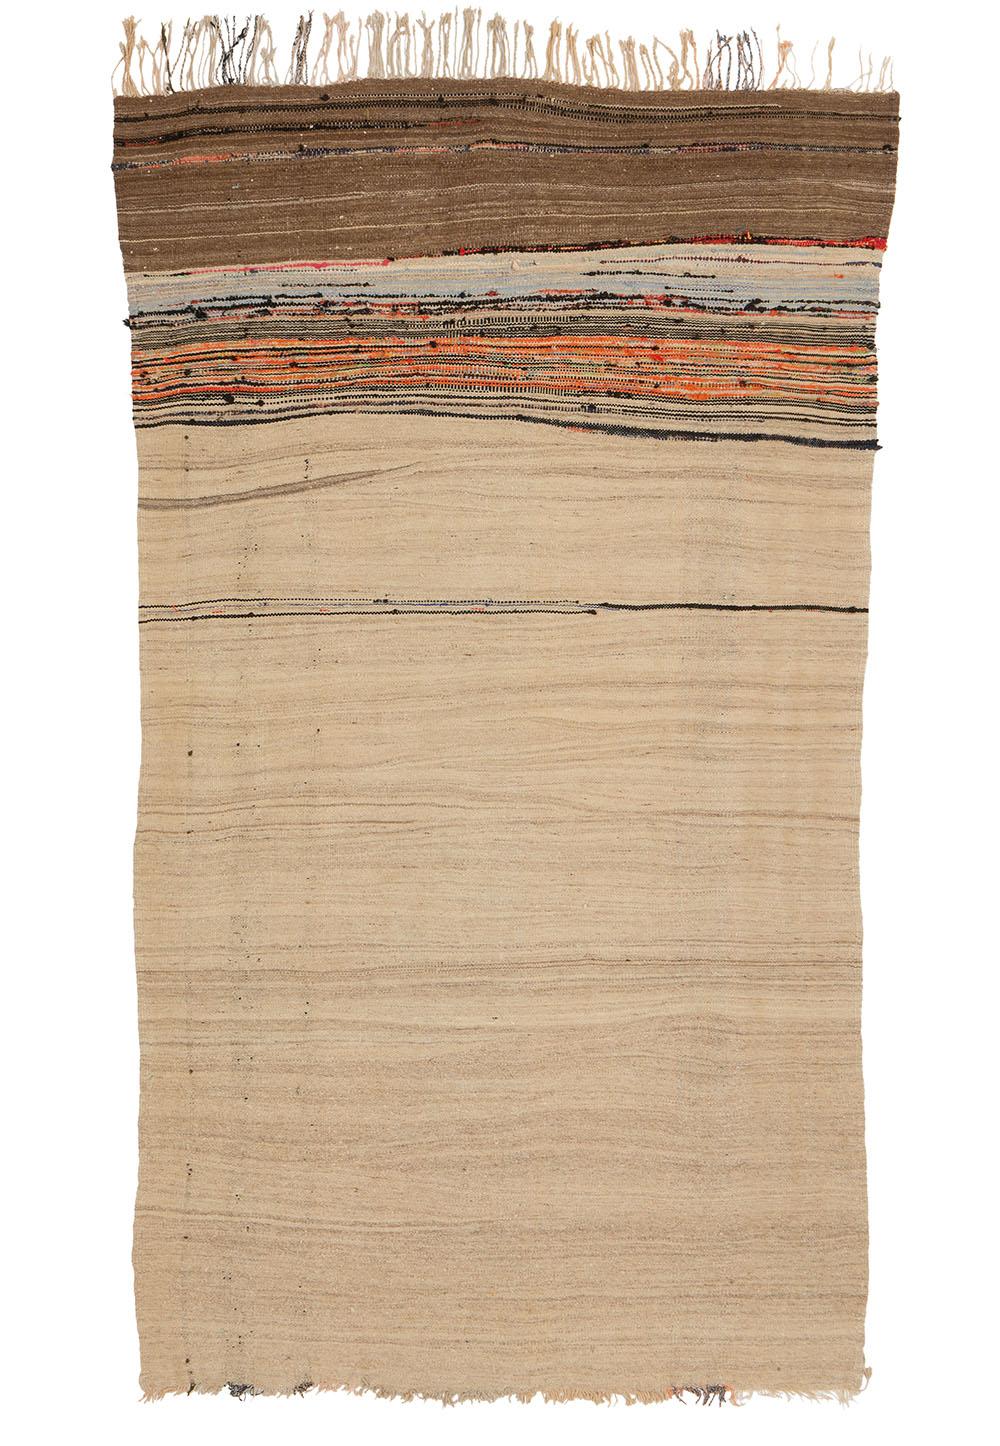 "Berber haik, Mejjat tribe, AntiAtlas, southern Morocco, second half 20th century. 1.15 x 1.95 m (3' 9"" x 6' 5""). Alexandra Sachs collection"